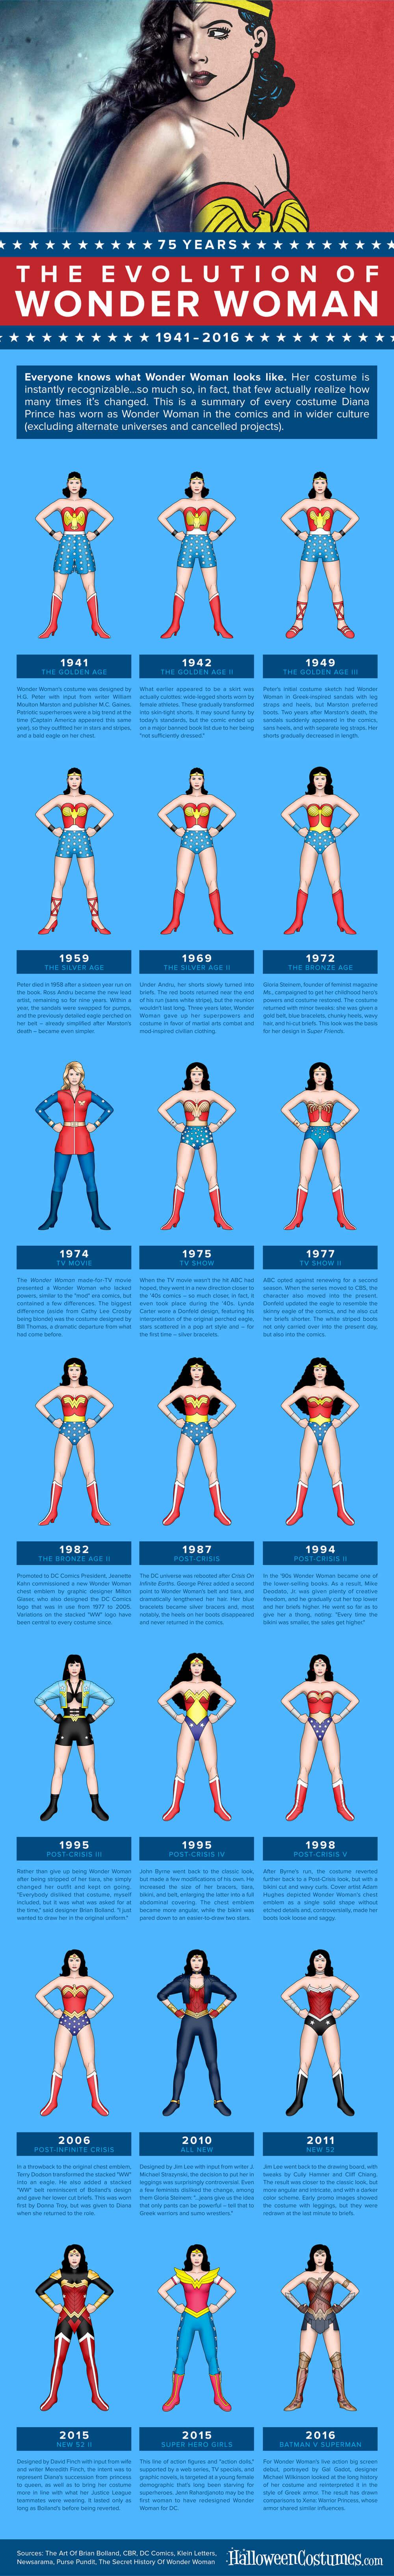 The Evolution of Wonder Woman